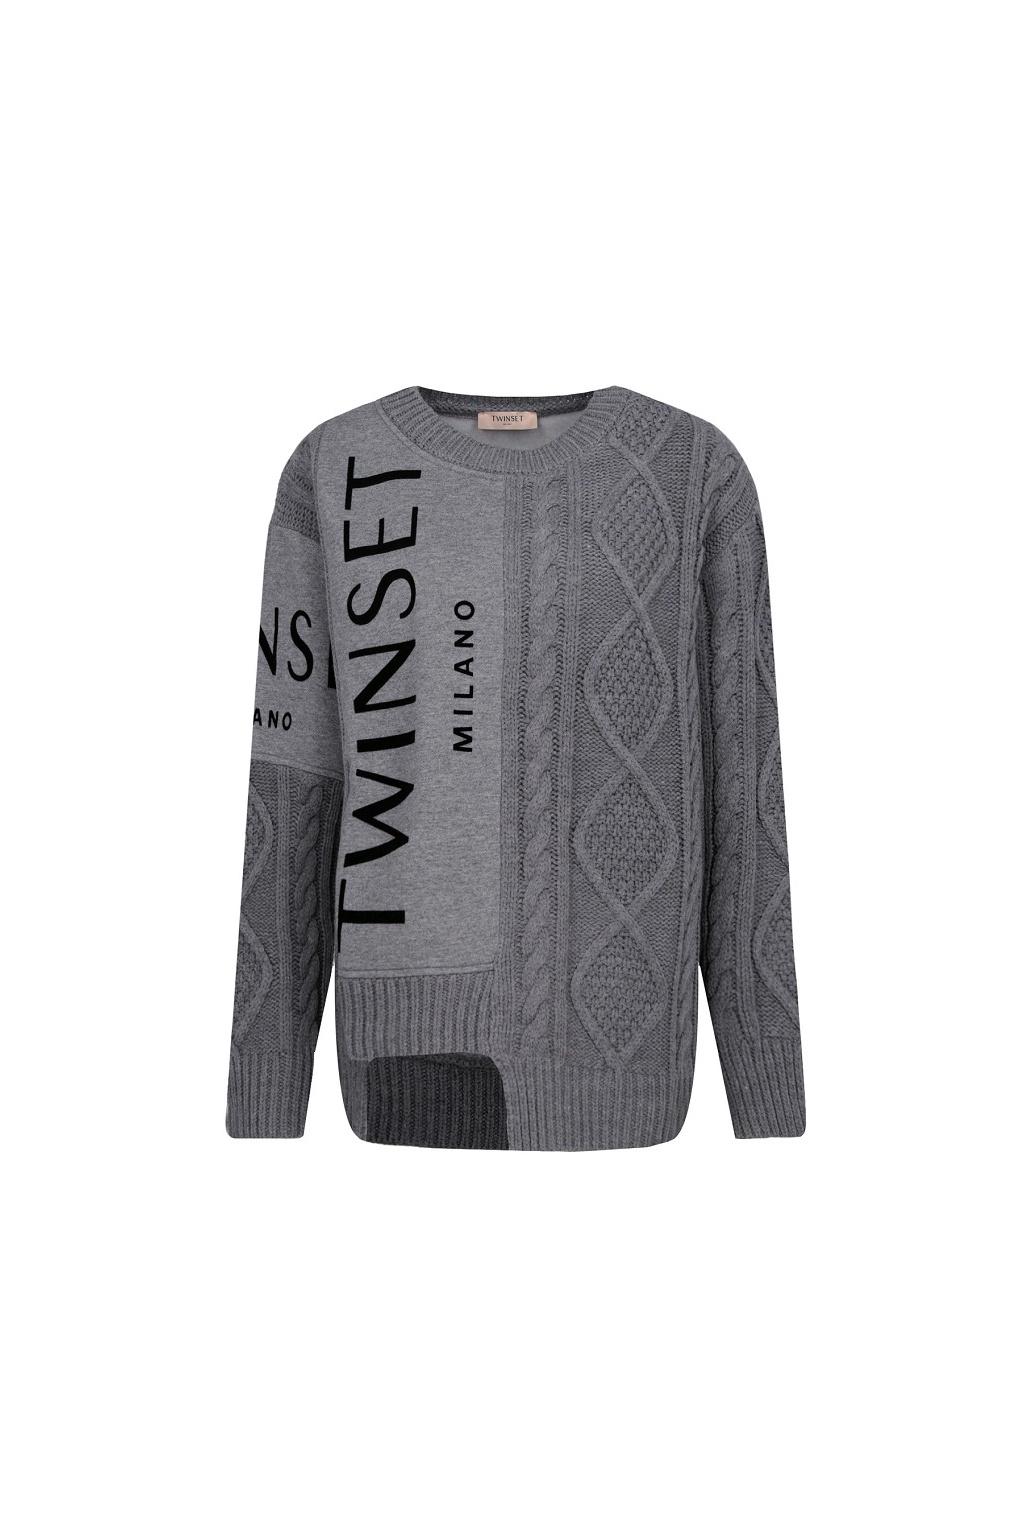 192TT3060 Twinset pletený svetr šedý